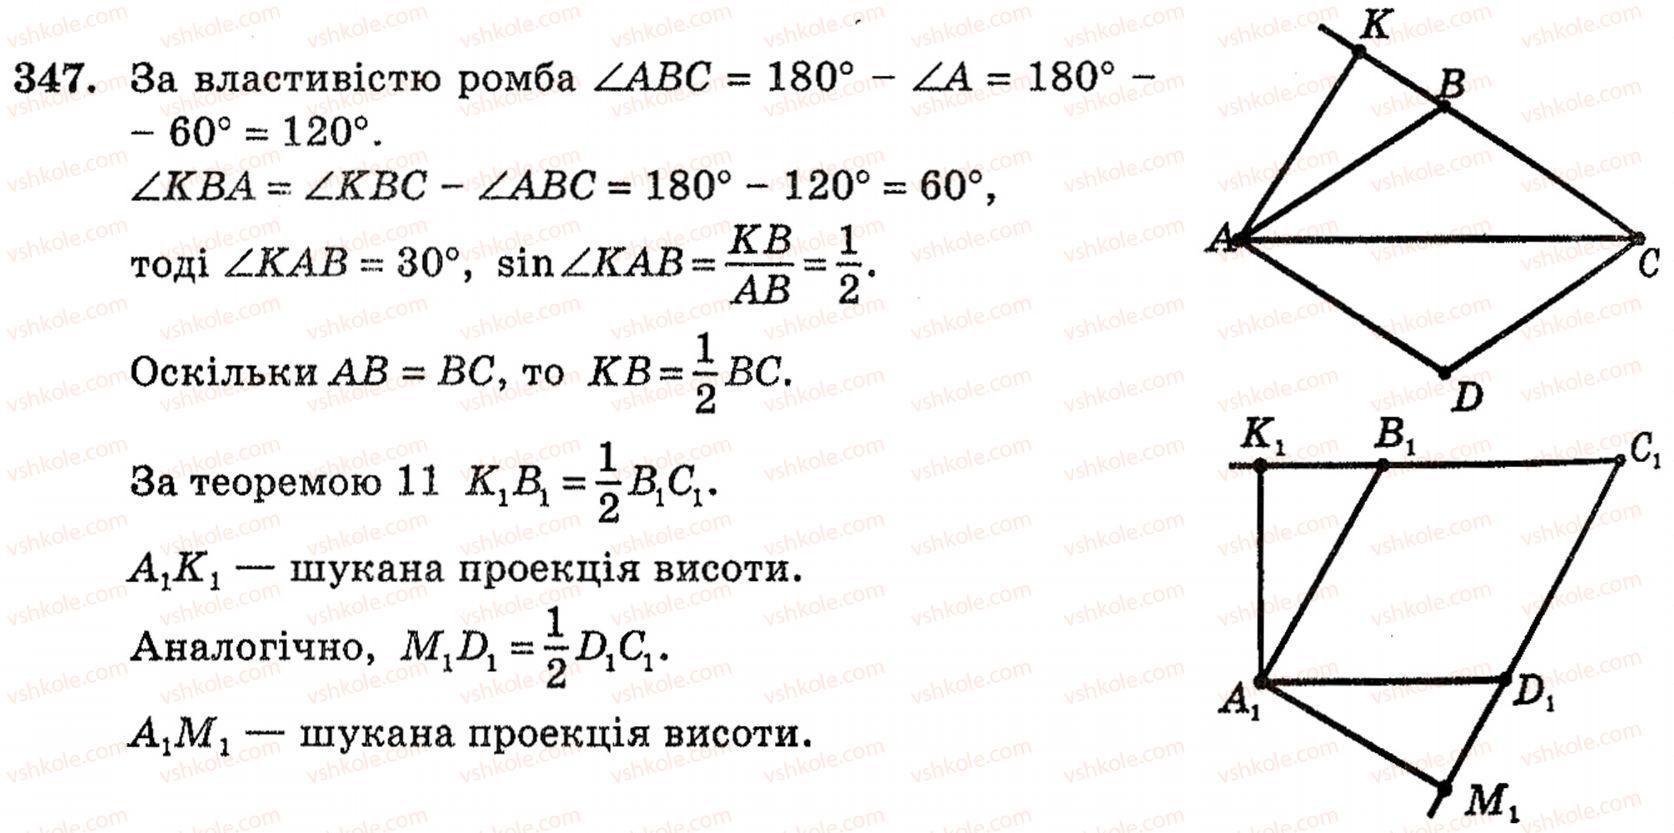 гдз 10 класс бевз решебник